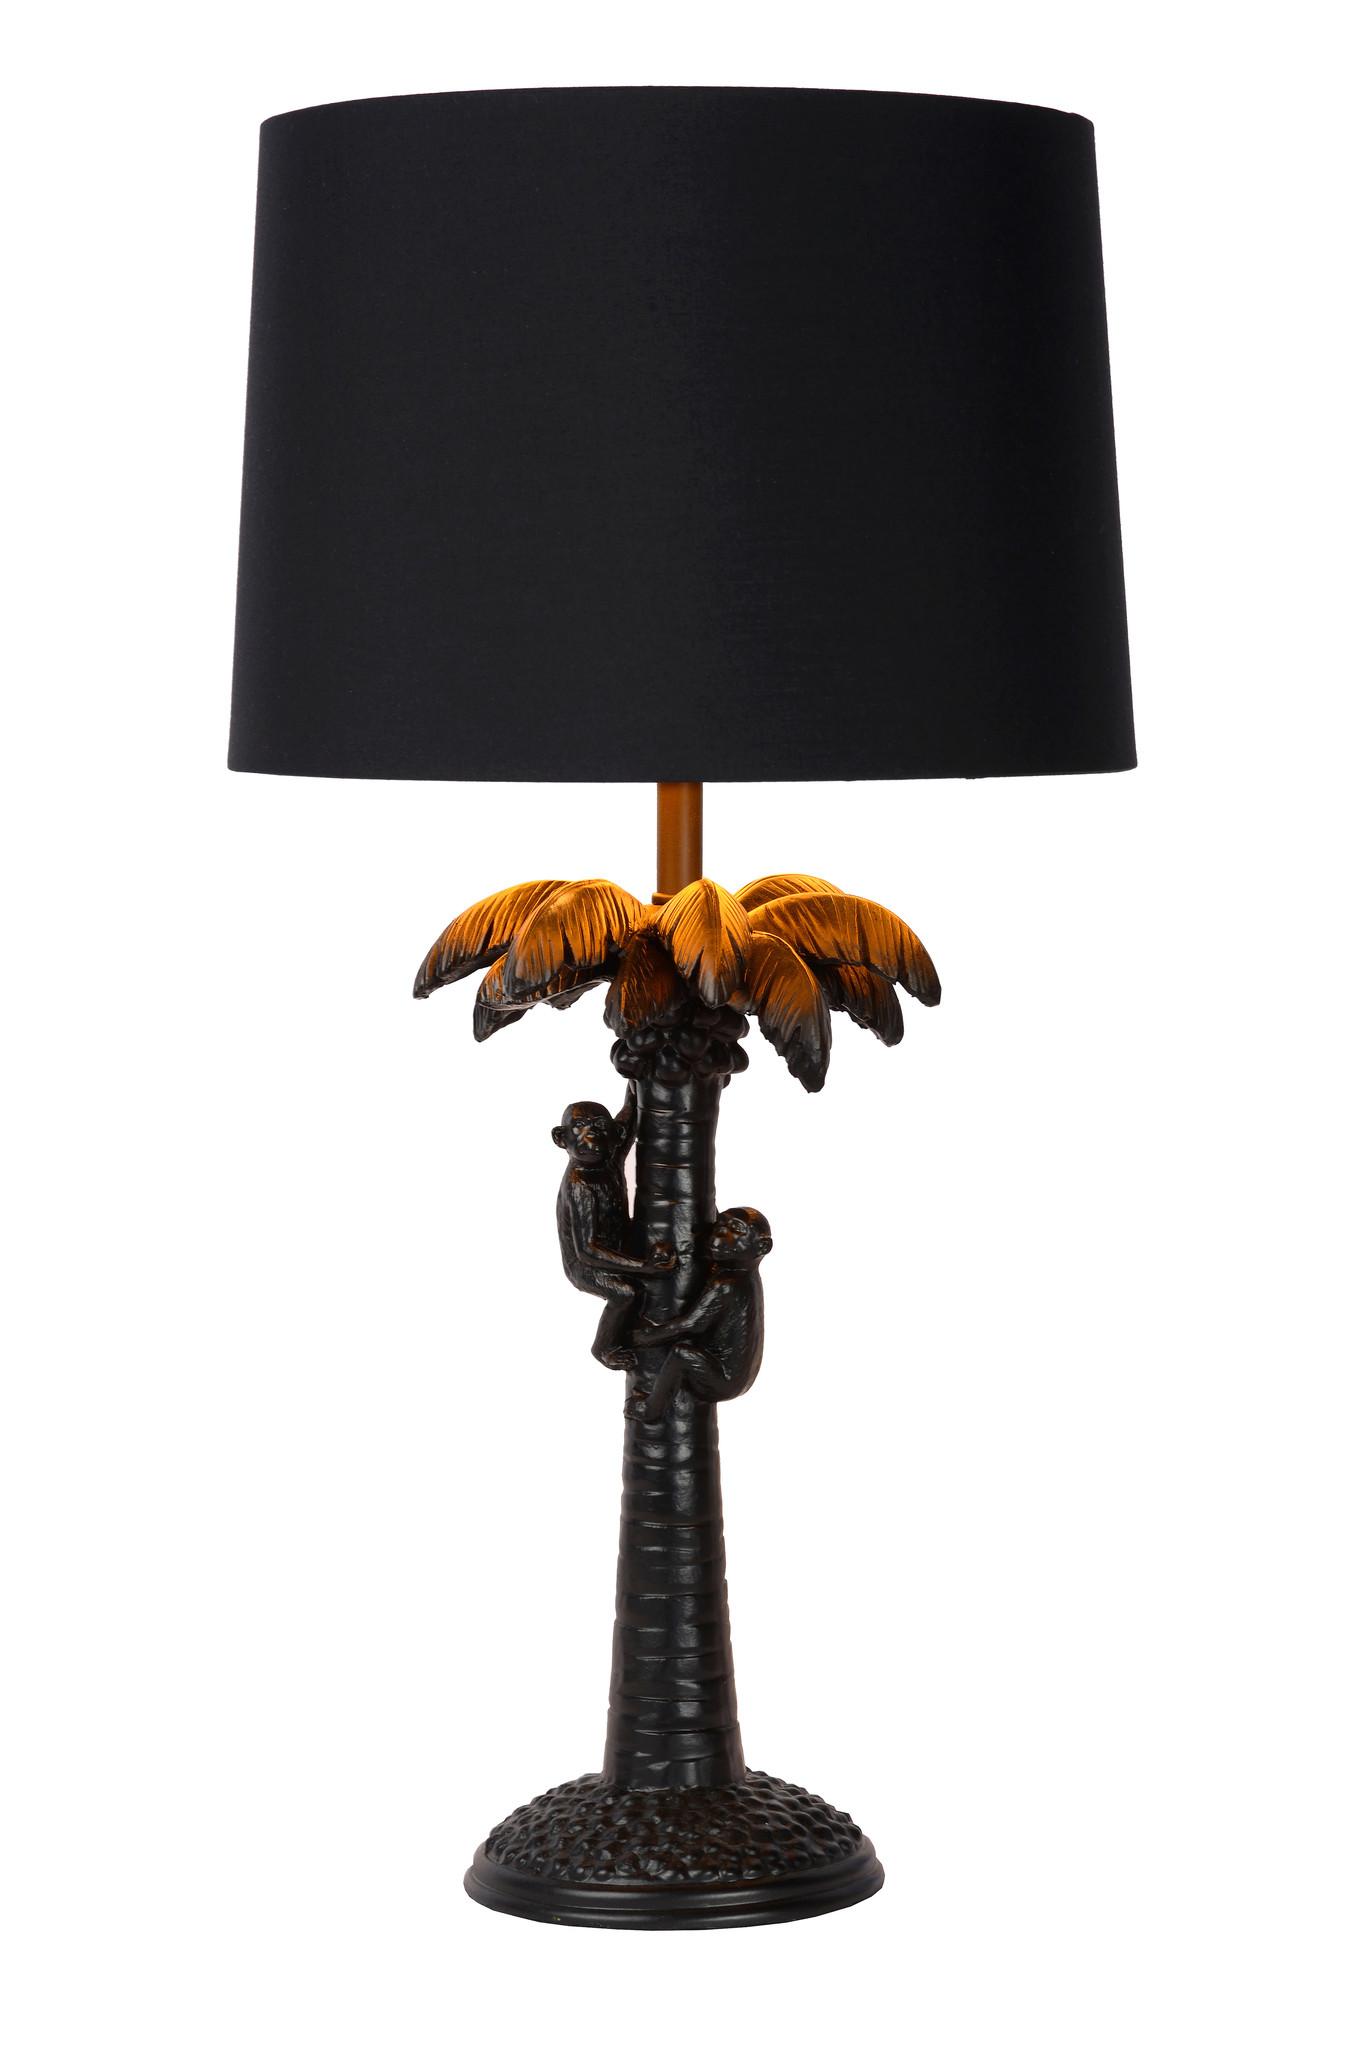 Lucide COCONUT Tafellamp E27/40W H50cm Zwart